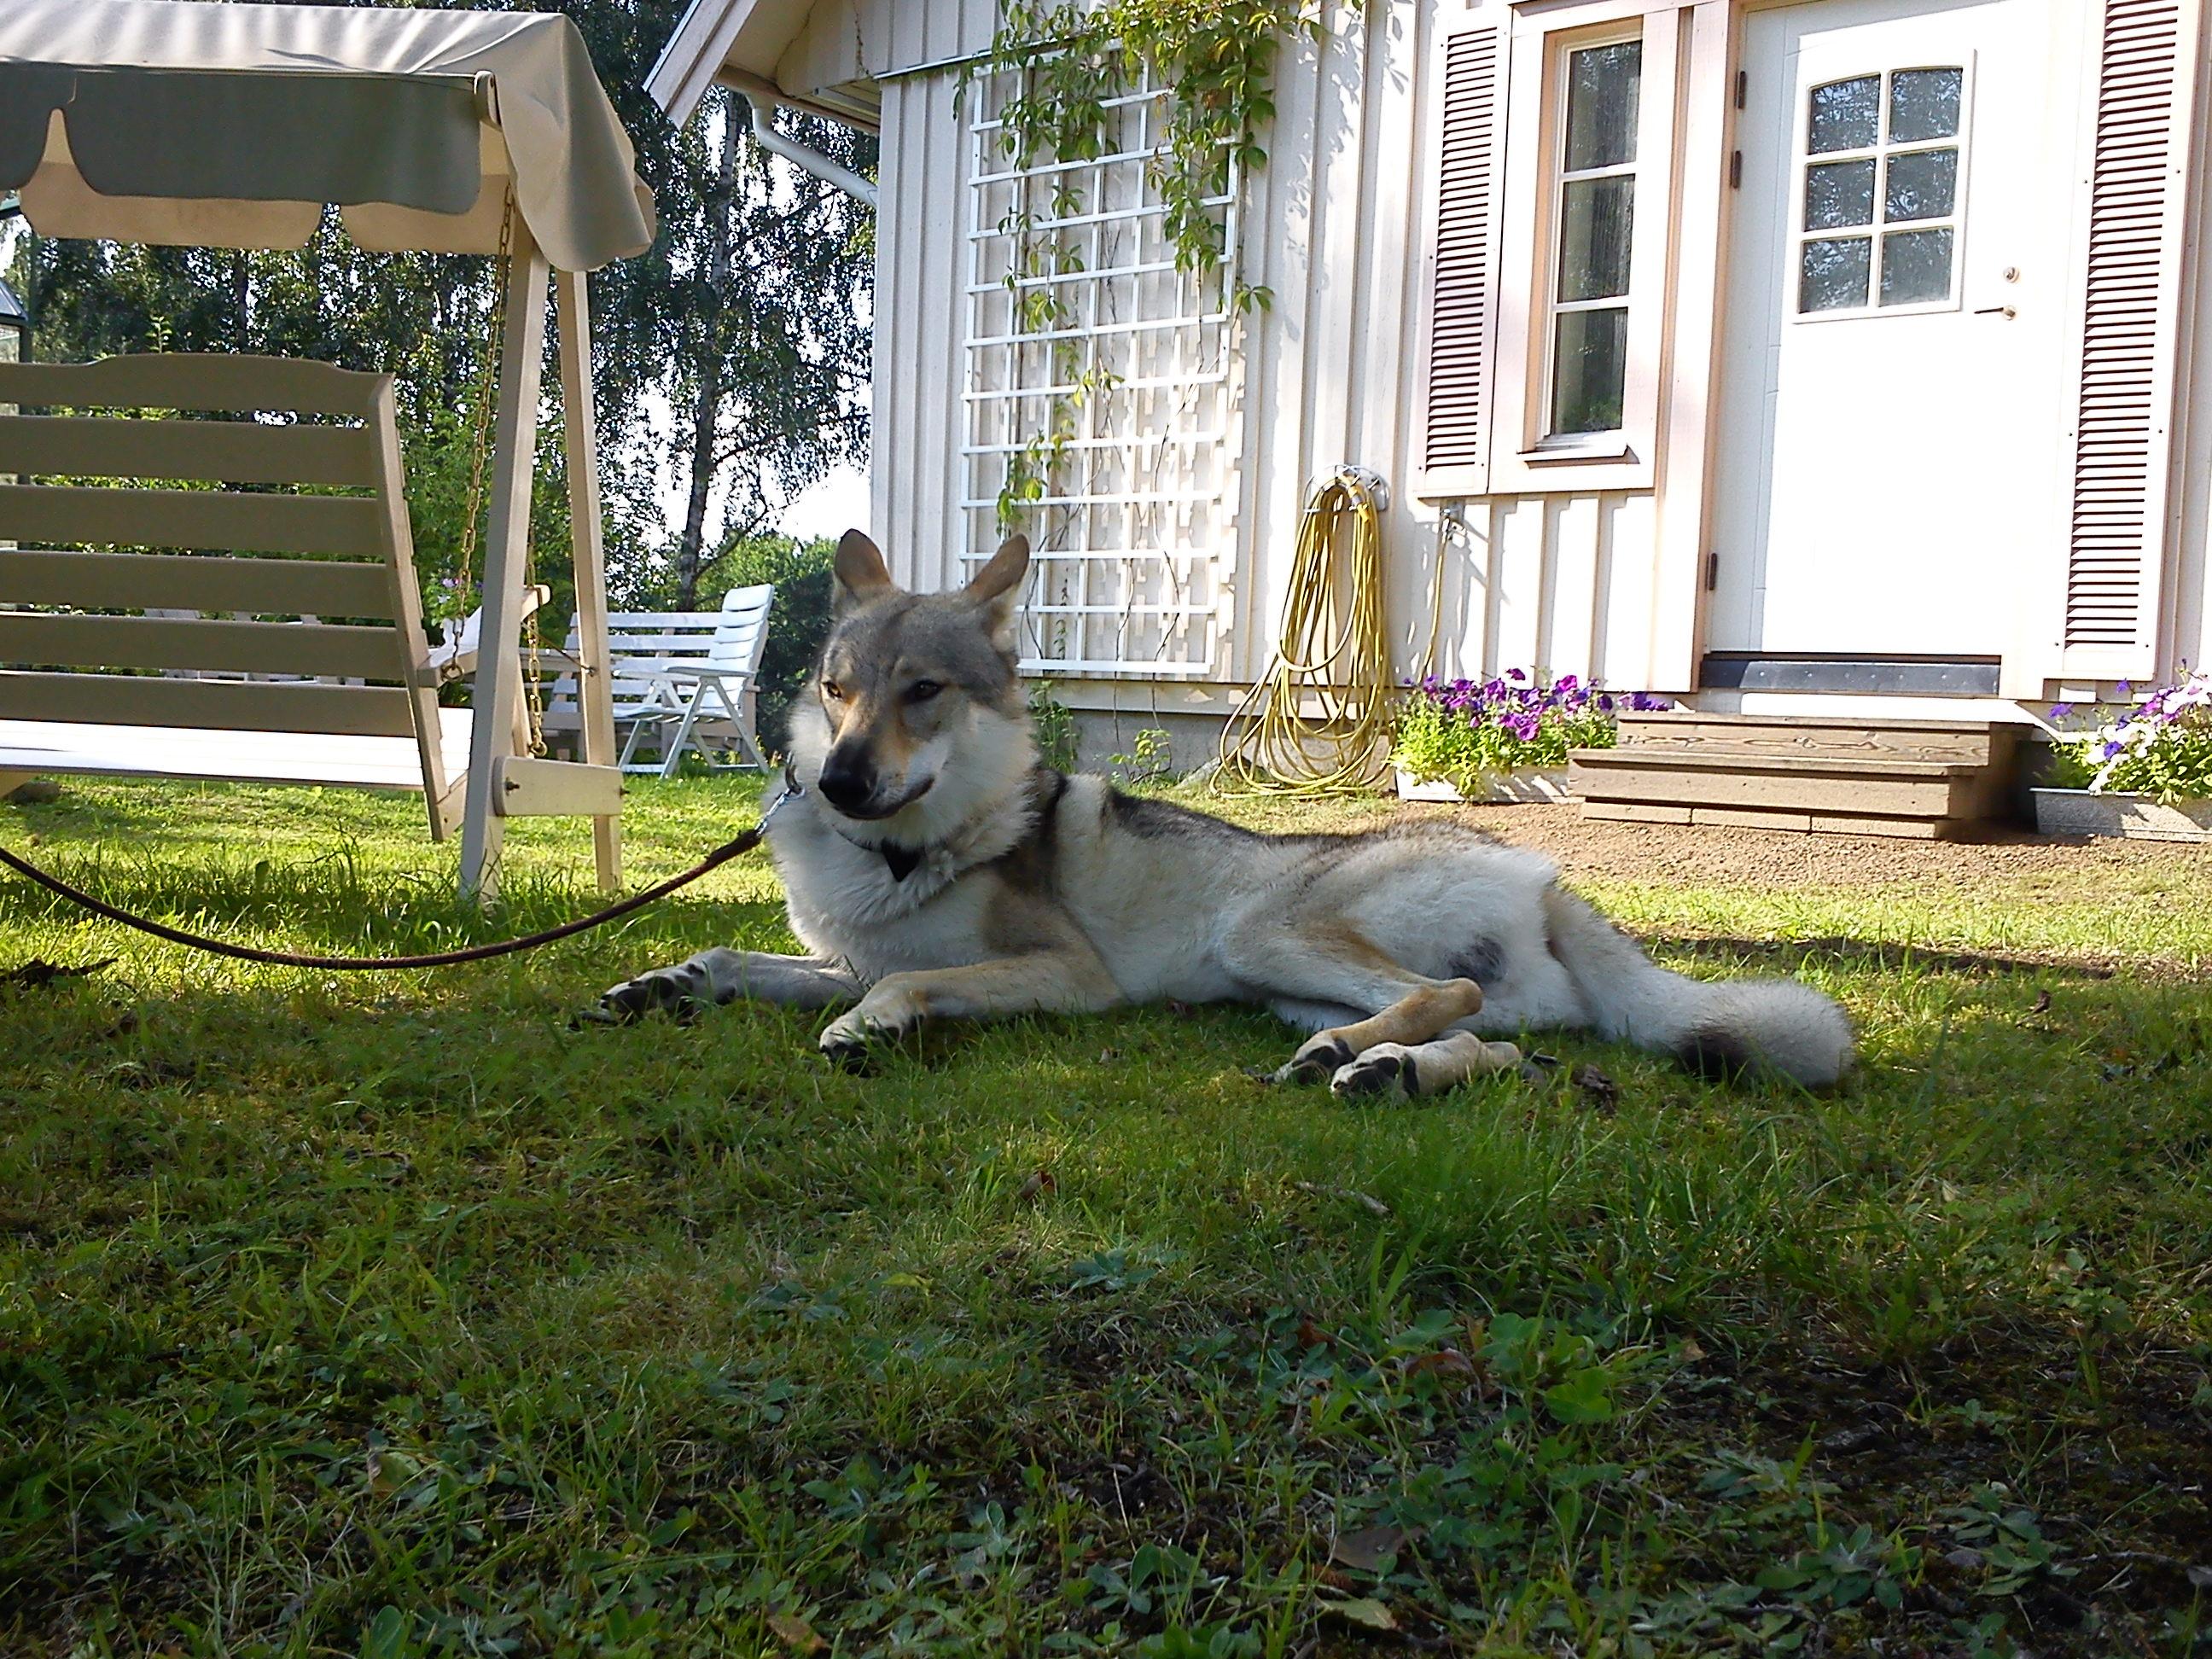 Чехословацкая волчья собака во дворе фото